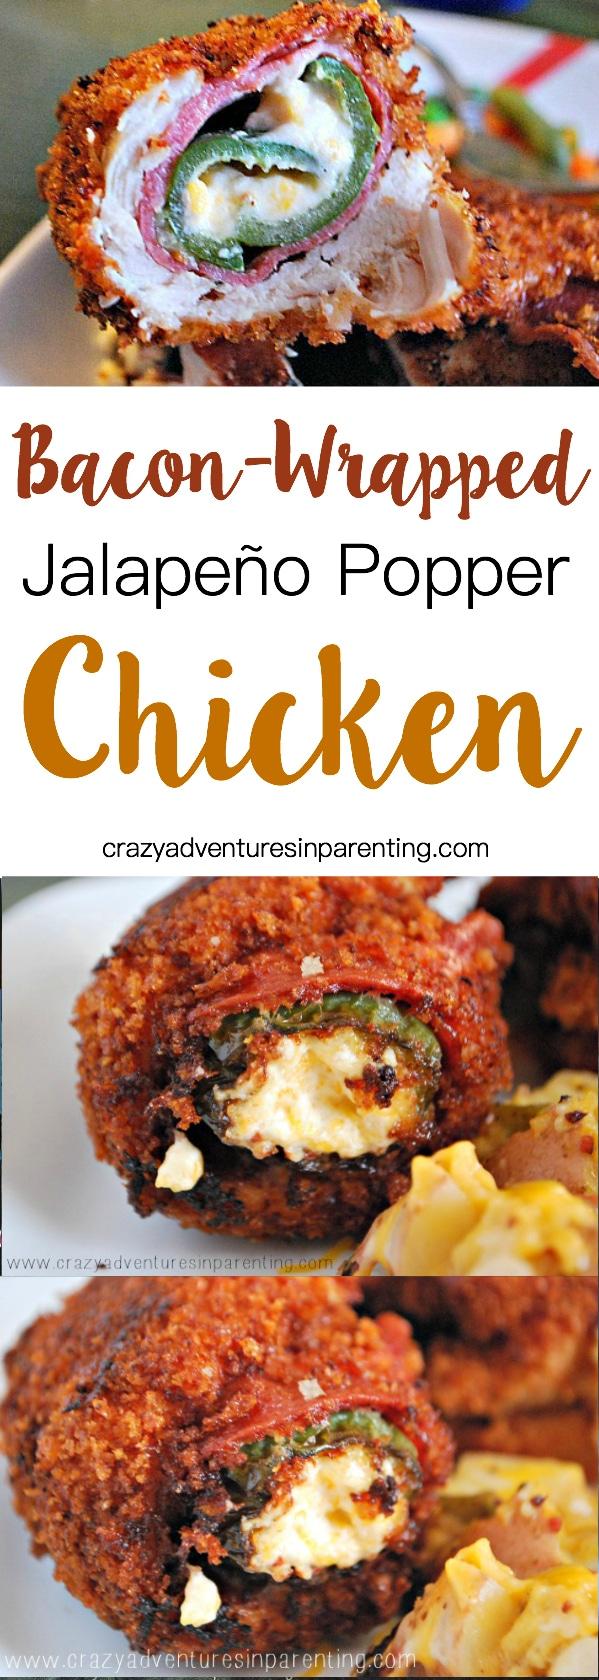 Bacon-Wrapped Jalapeño Popper Chicken Recipe